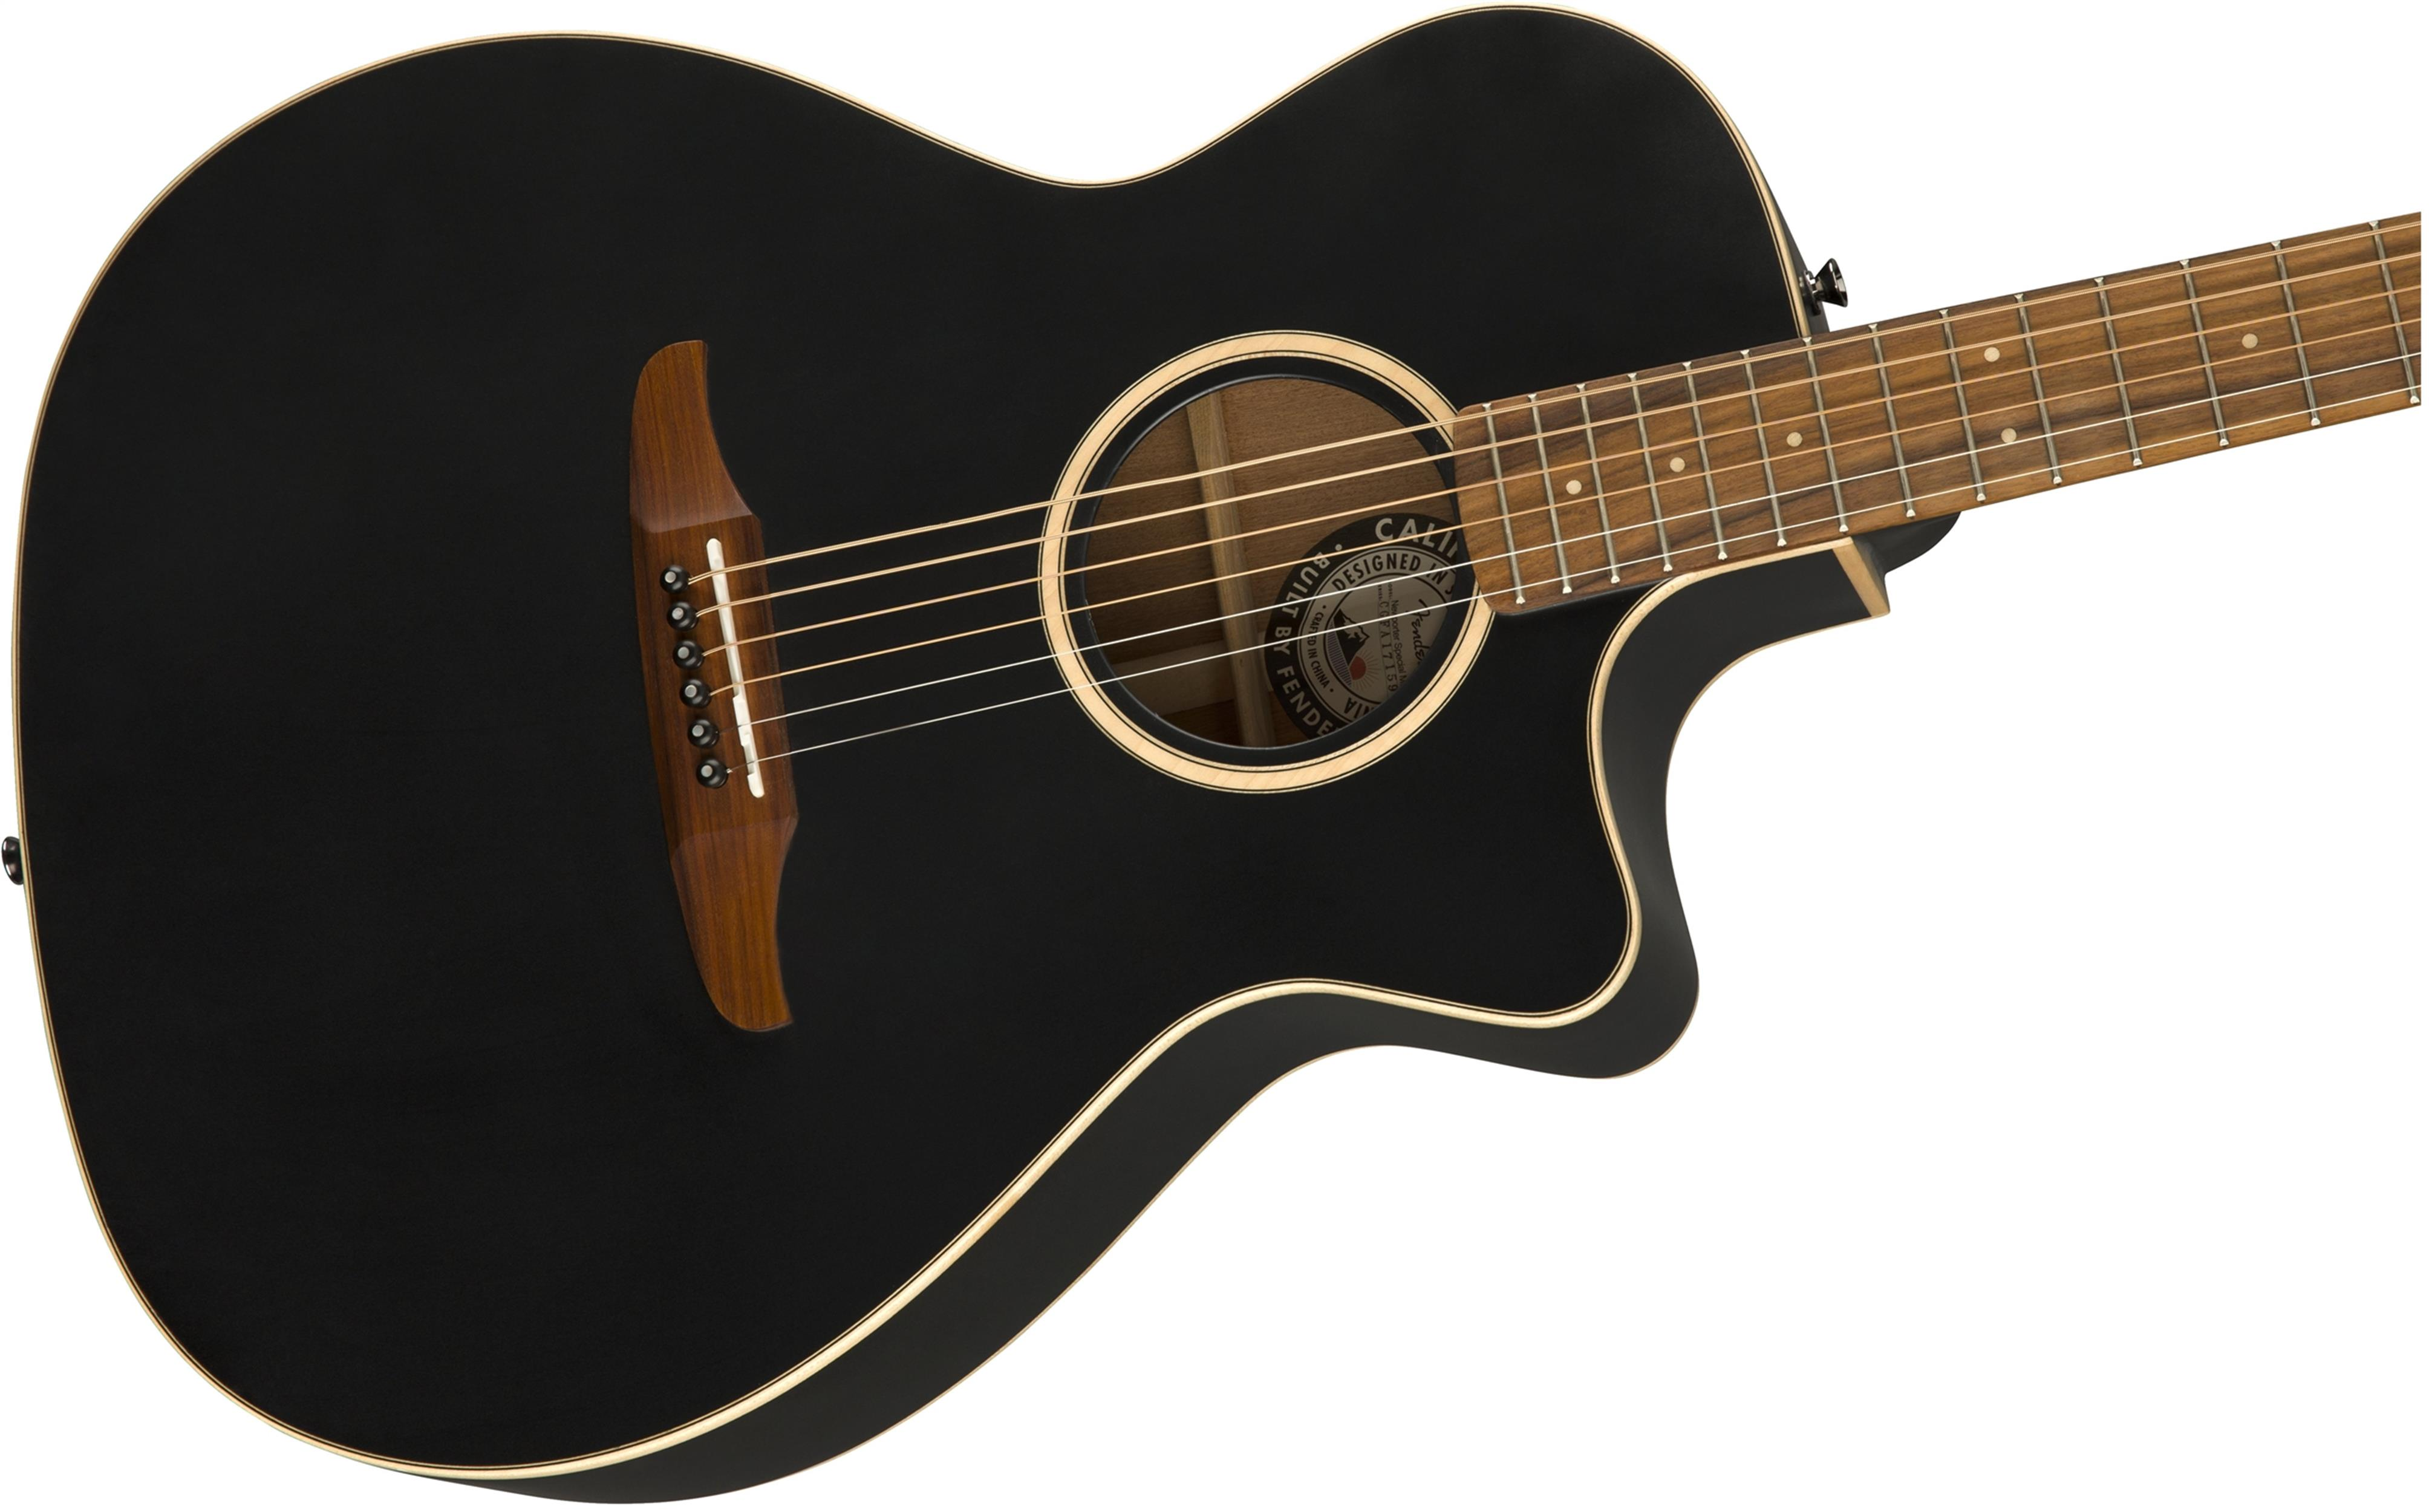 FENDER-Newporter-Special-PF-Matte-Black-w-bag-0970843106-sku-20660